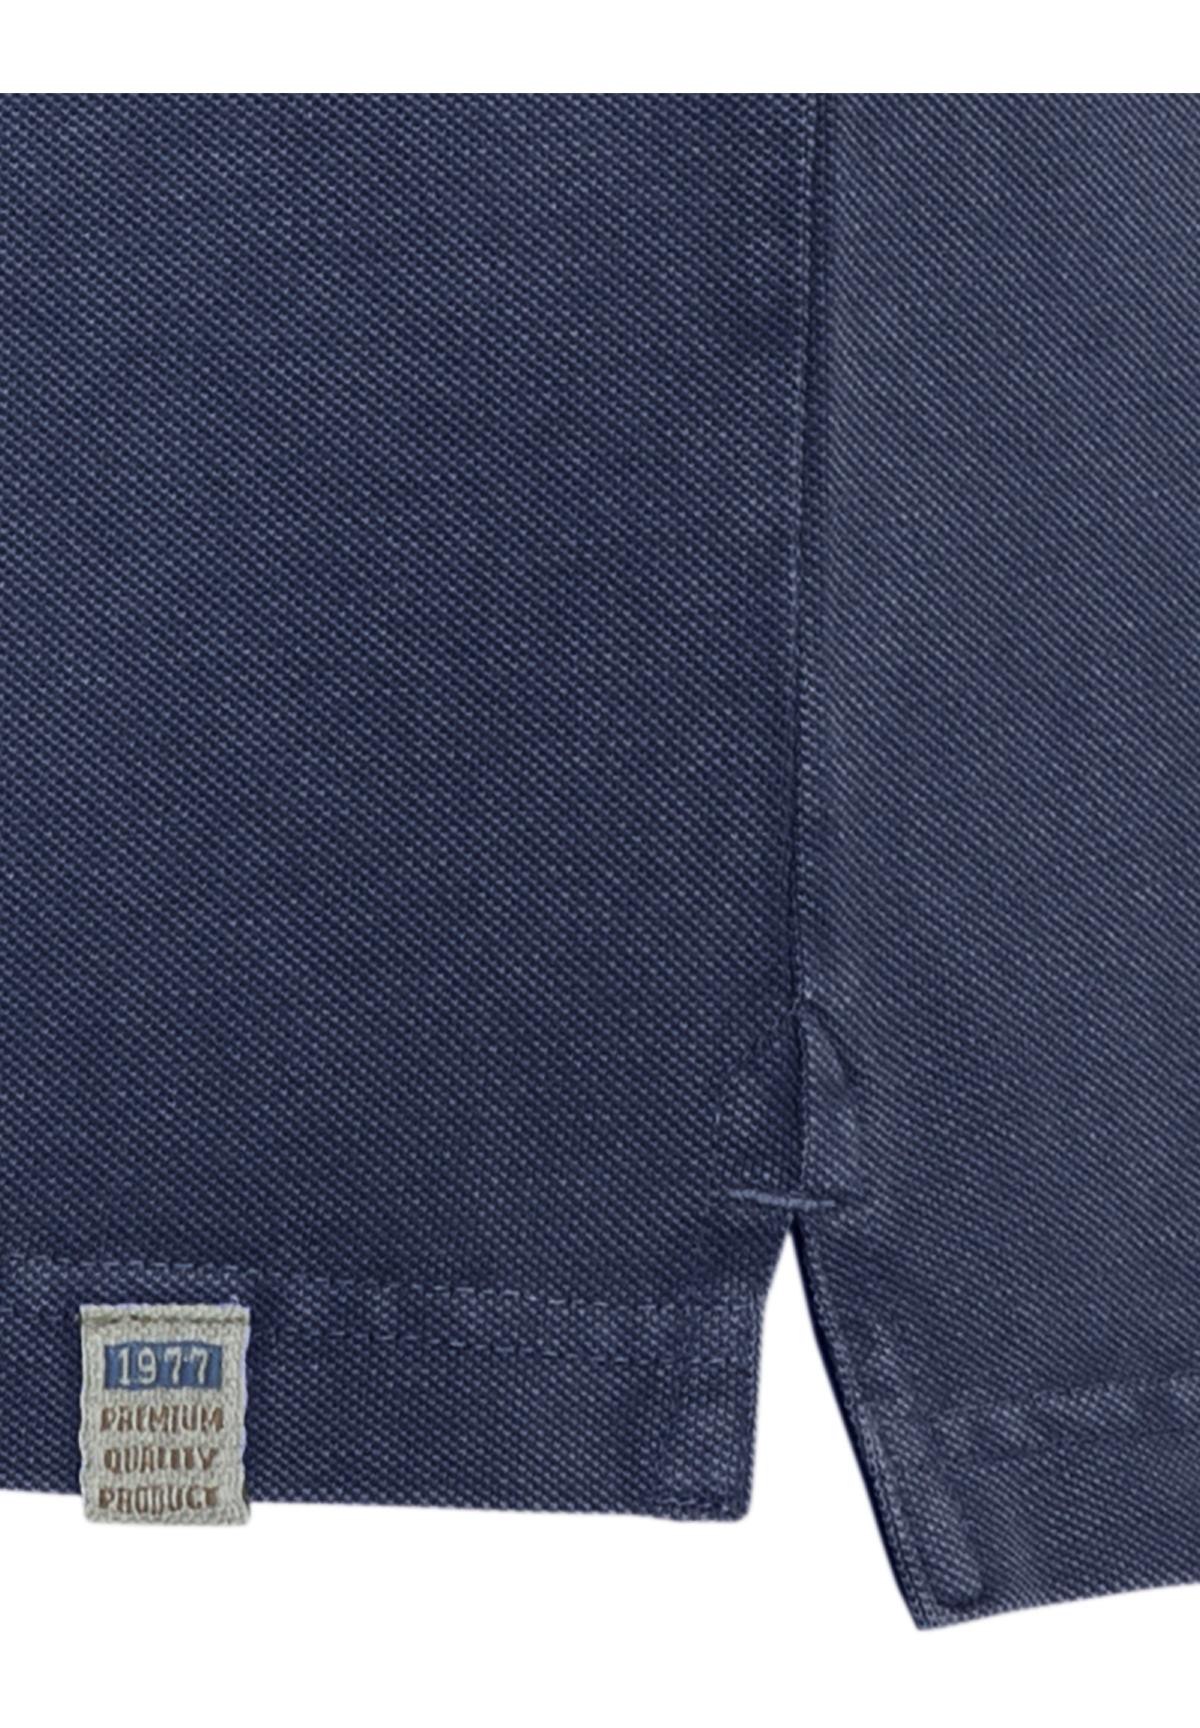 Camel-Active-Herren-Shirt-Poloshirt-Pique-Regular-Fit-NEU Indexbild 29